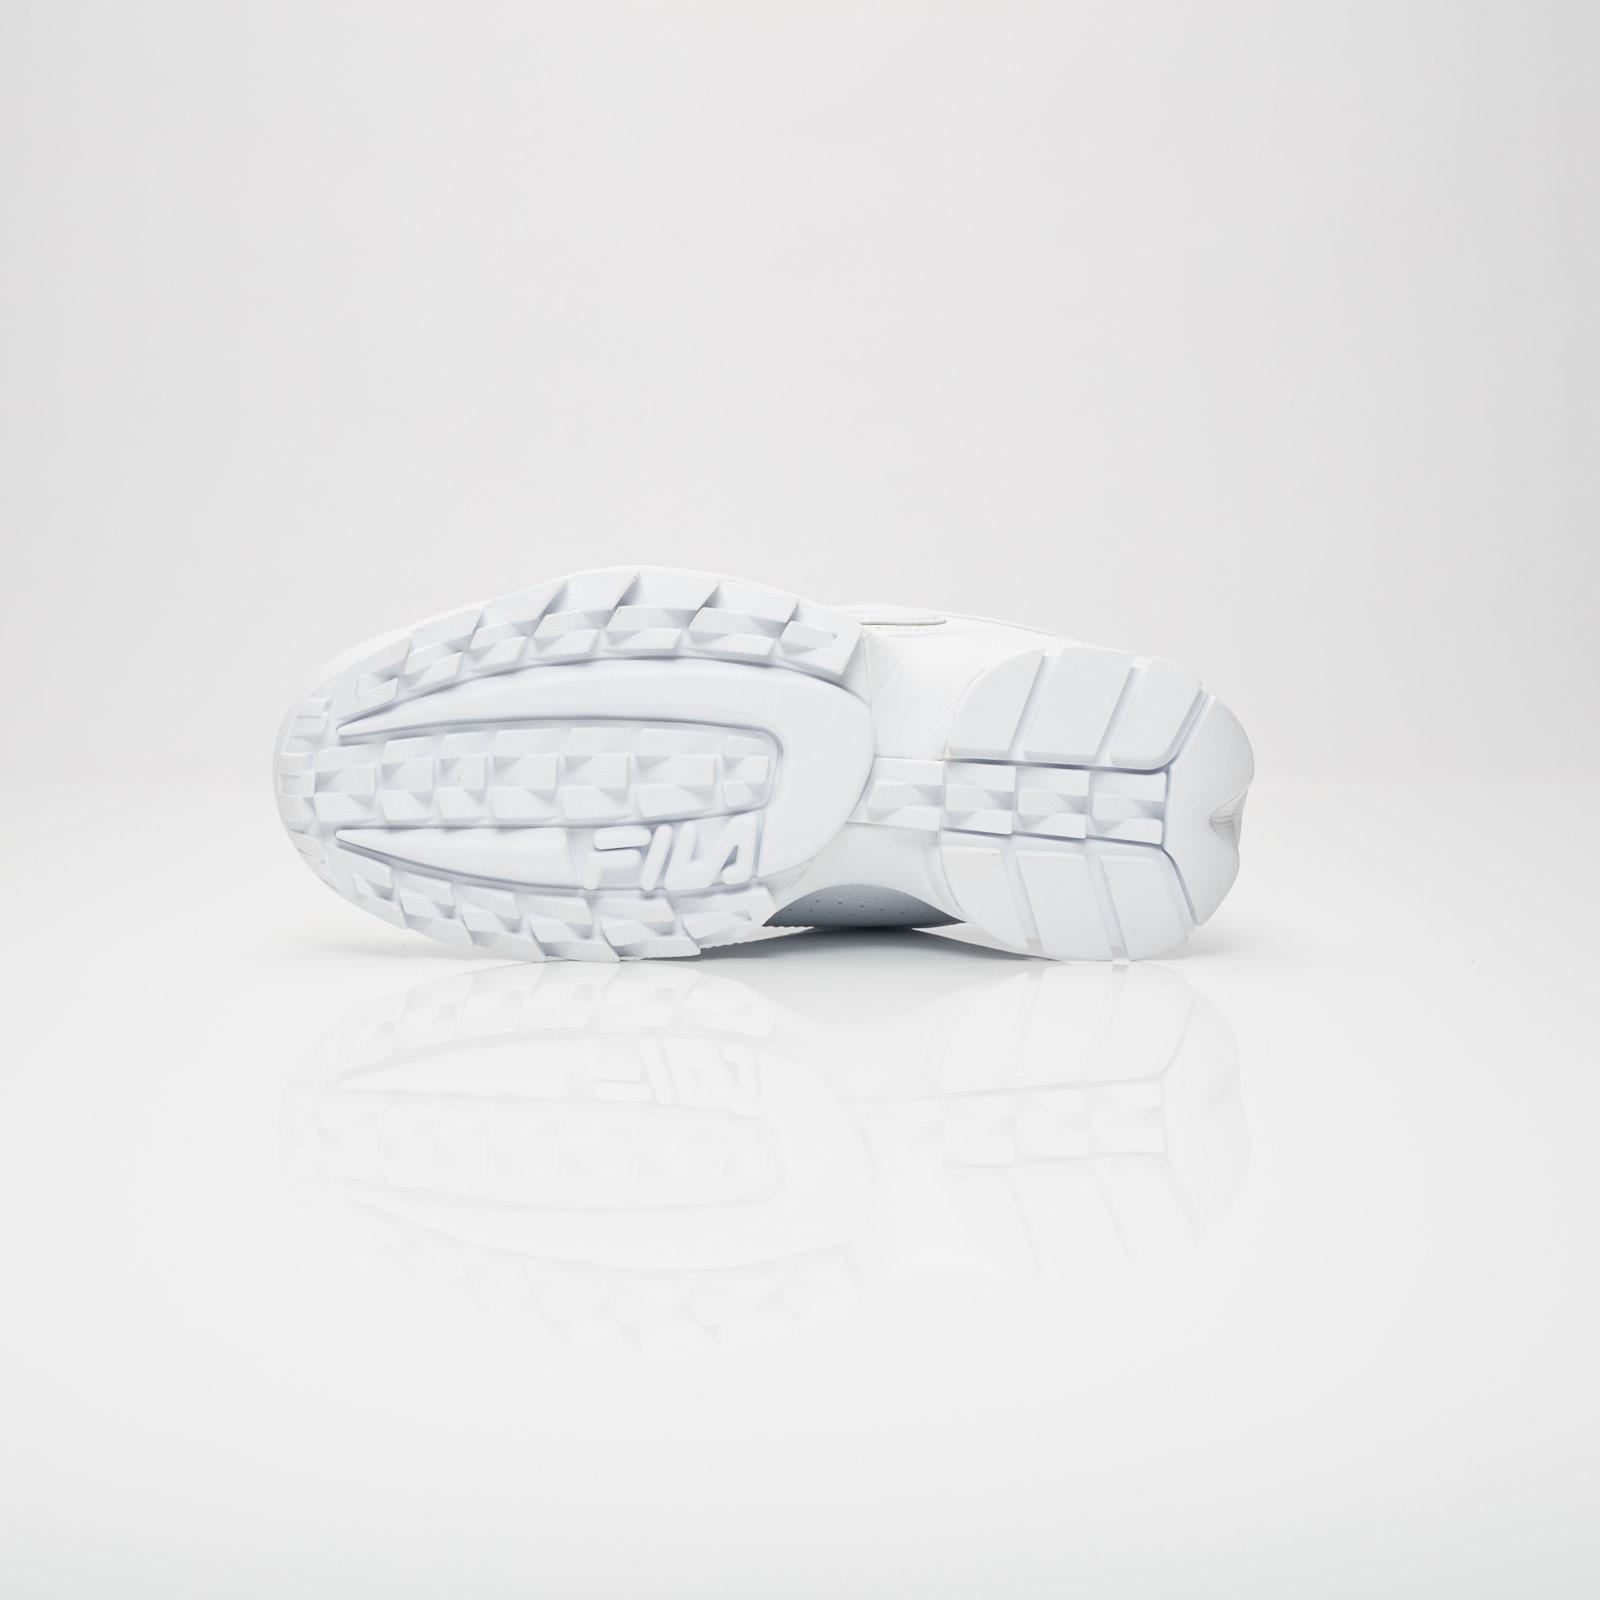 Fila Disruptor II Premium 5fm00002 125 Sneakersnstuff I